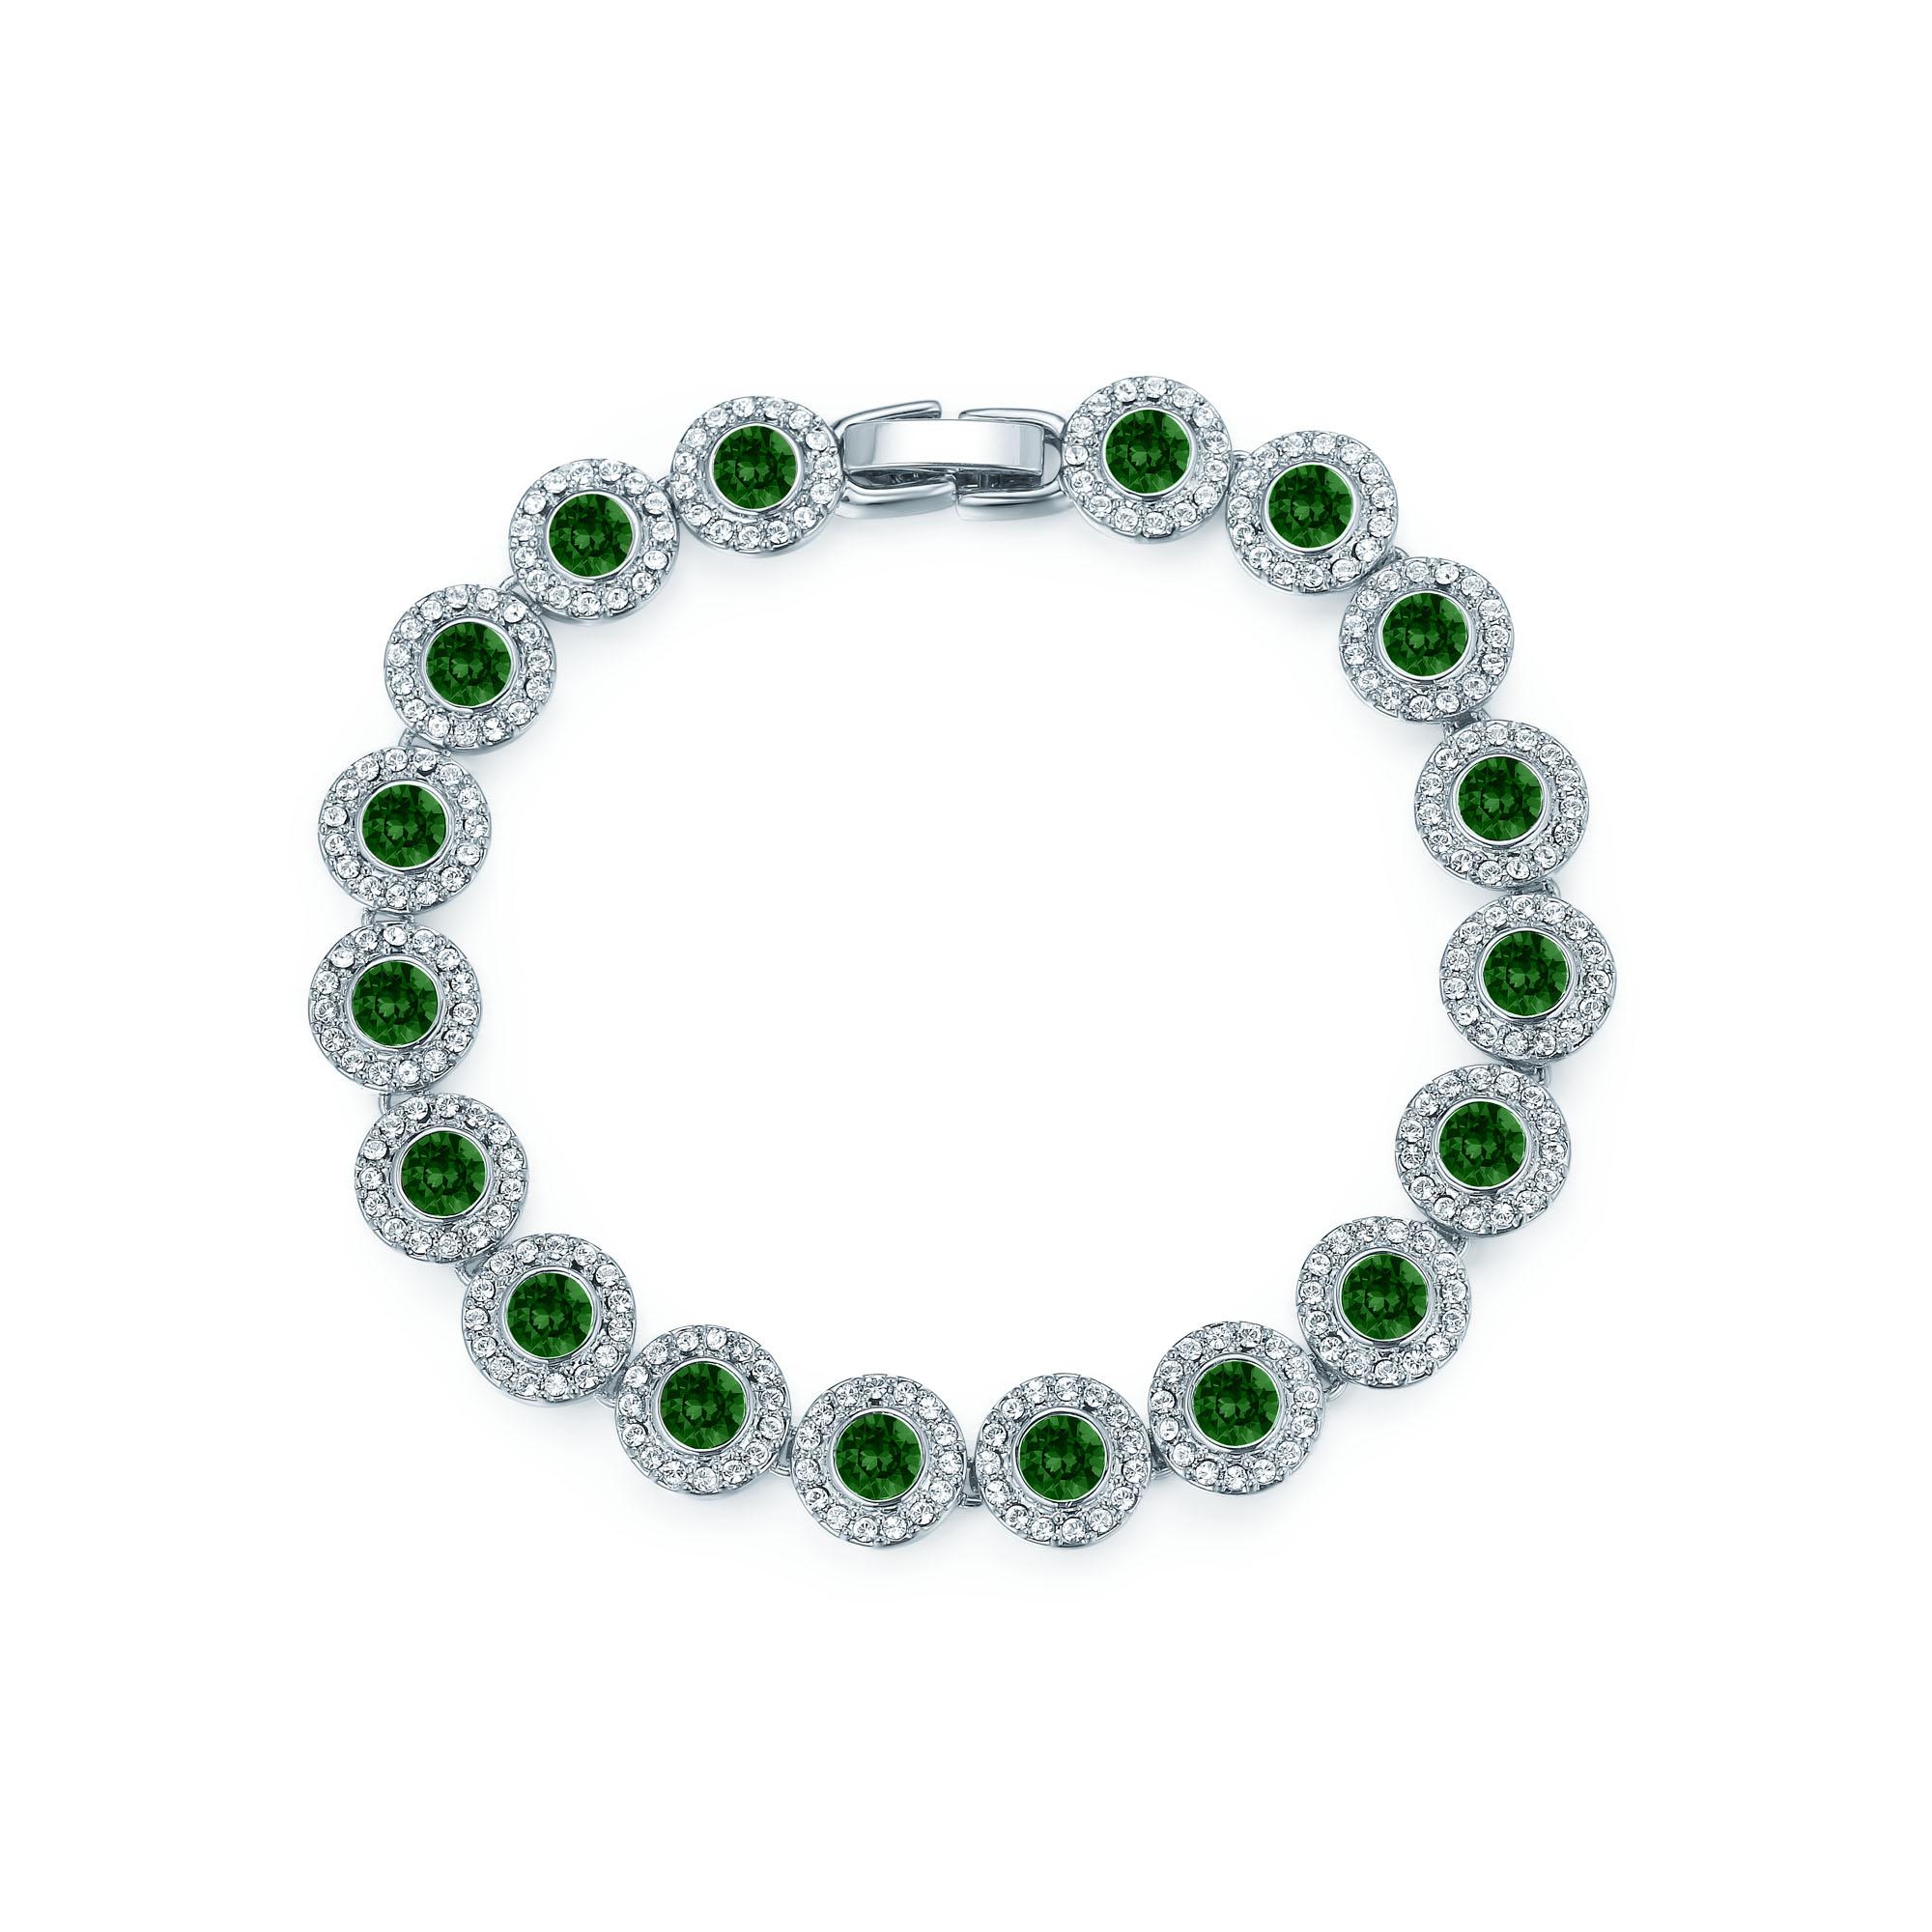 Swarovski® Crystal Bracelets - Made with Swarovski® Crystals ... 7f66f5f720